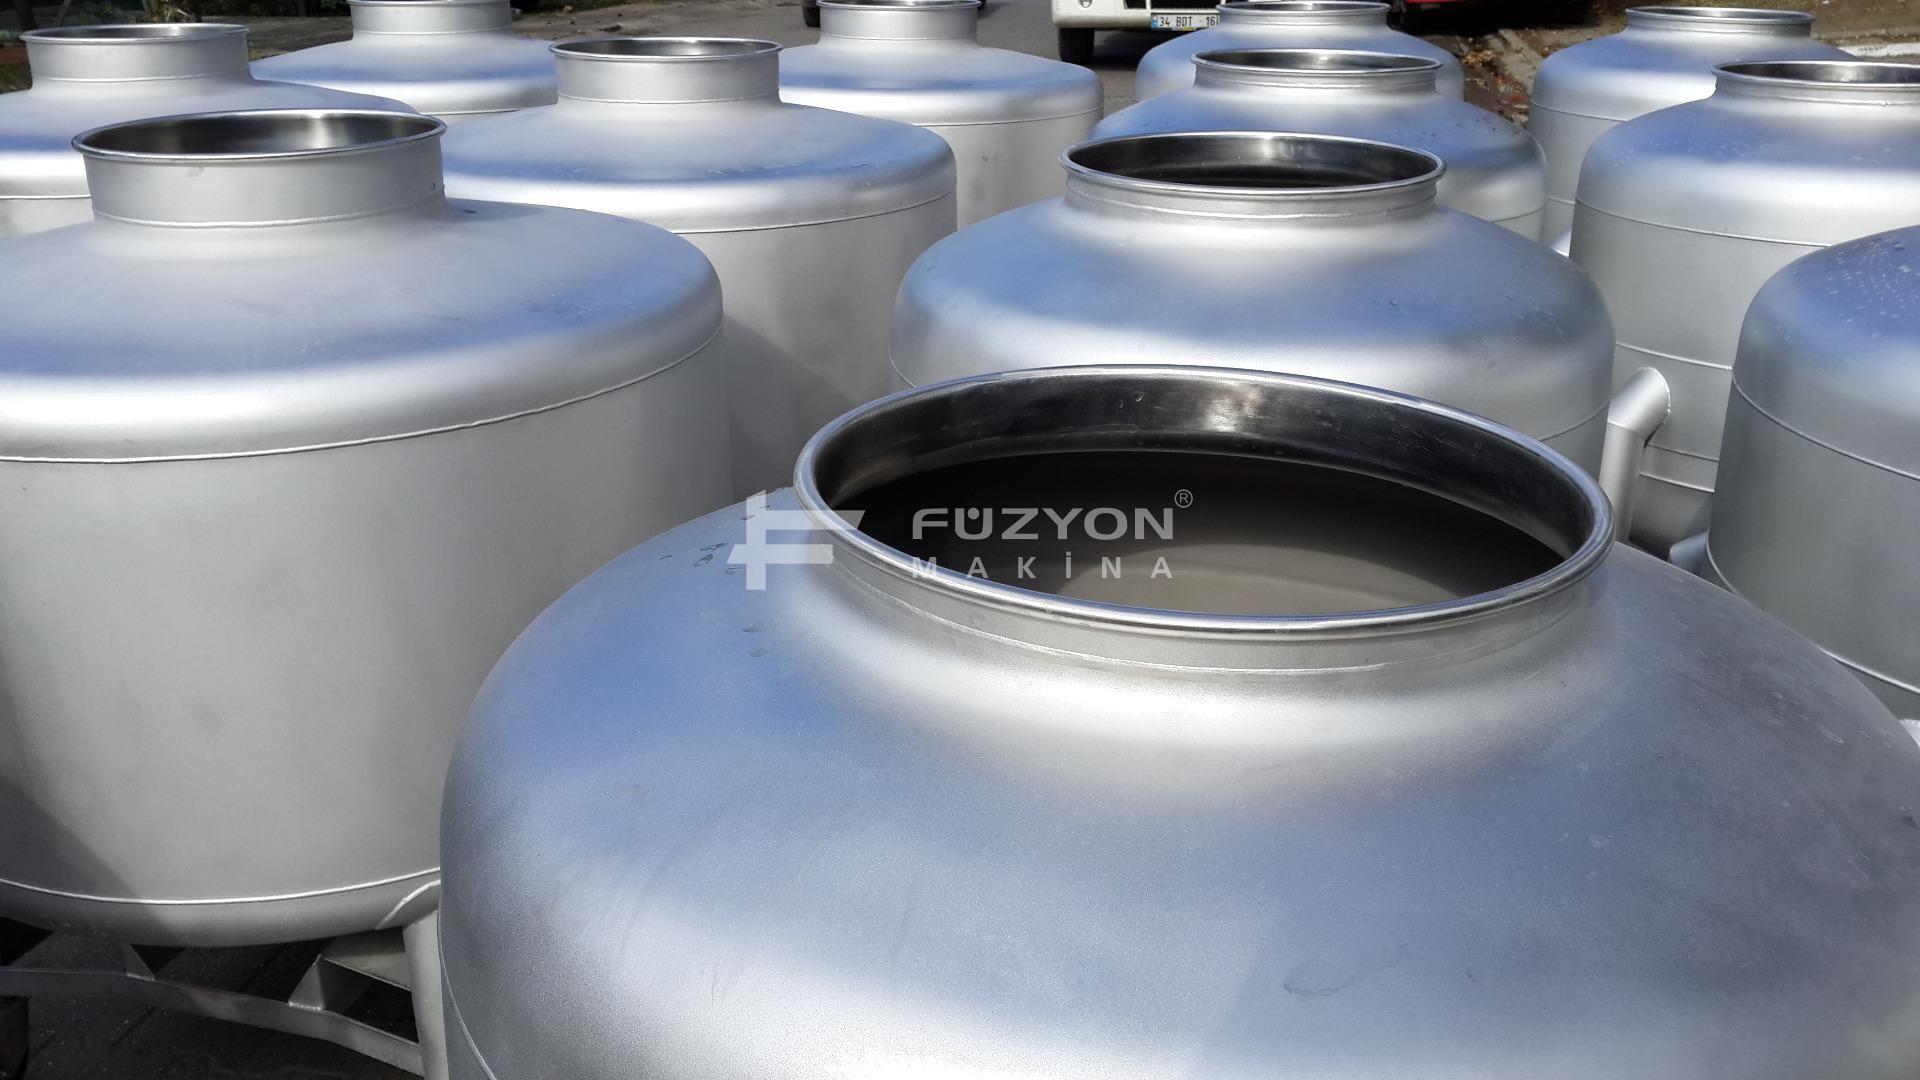 350-600 litre Kapasiteli Mobil Pot Tankları   Füzyon Makina